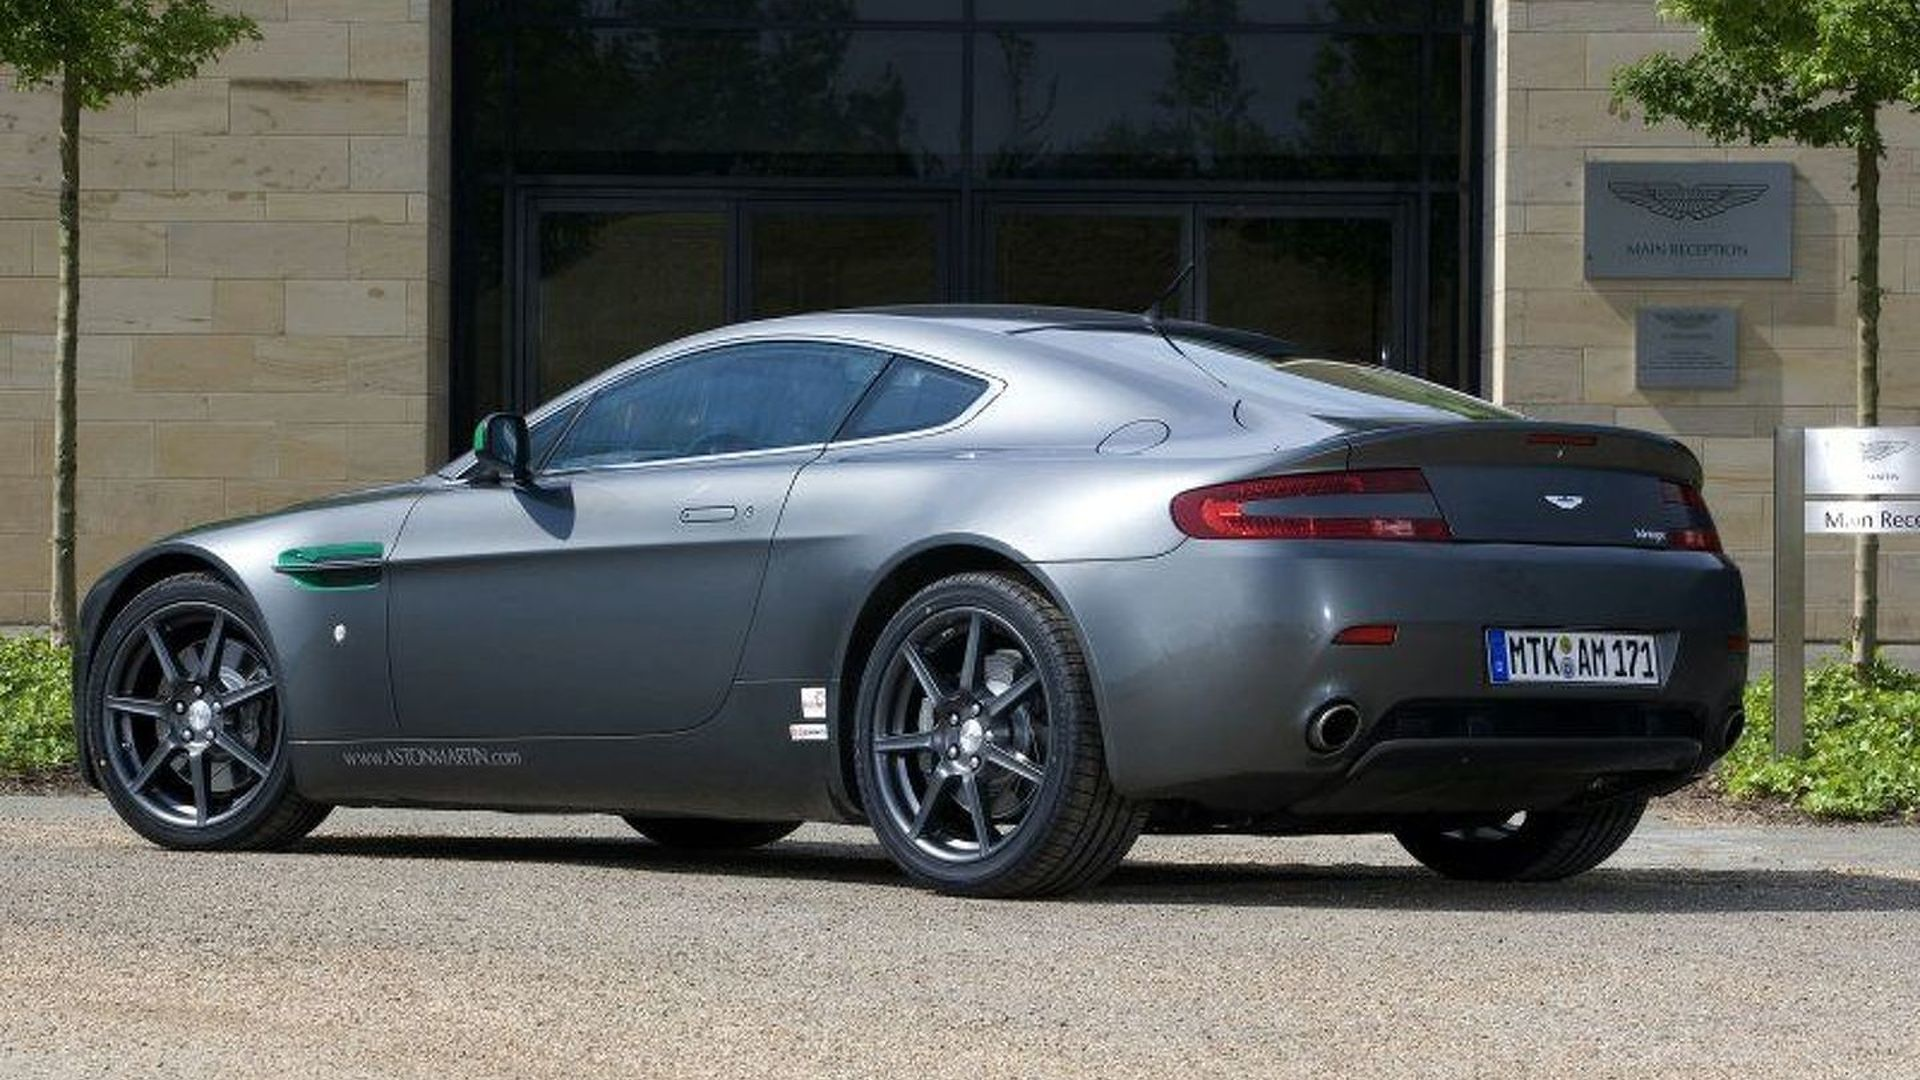 Aston Martin V8 Vantage 30000 Miles In 30 Days Motor1 Com Photos